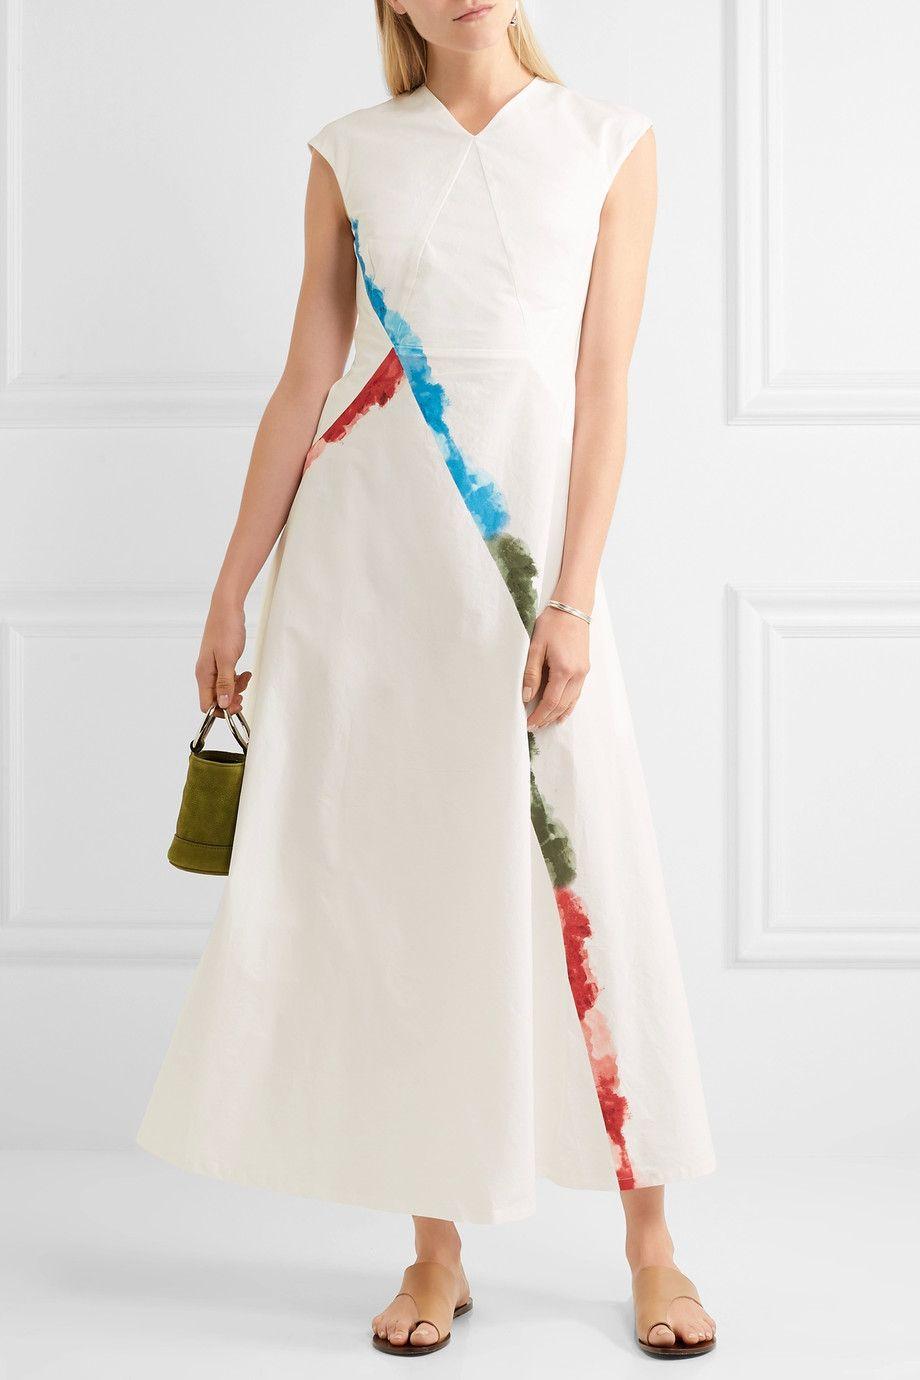 Tomas Maier Woman Cutout Printed Stretch-cotton Maxi Dress White Size 6 Tomas Maier ezMSIQn3u